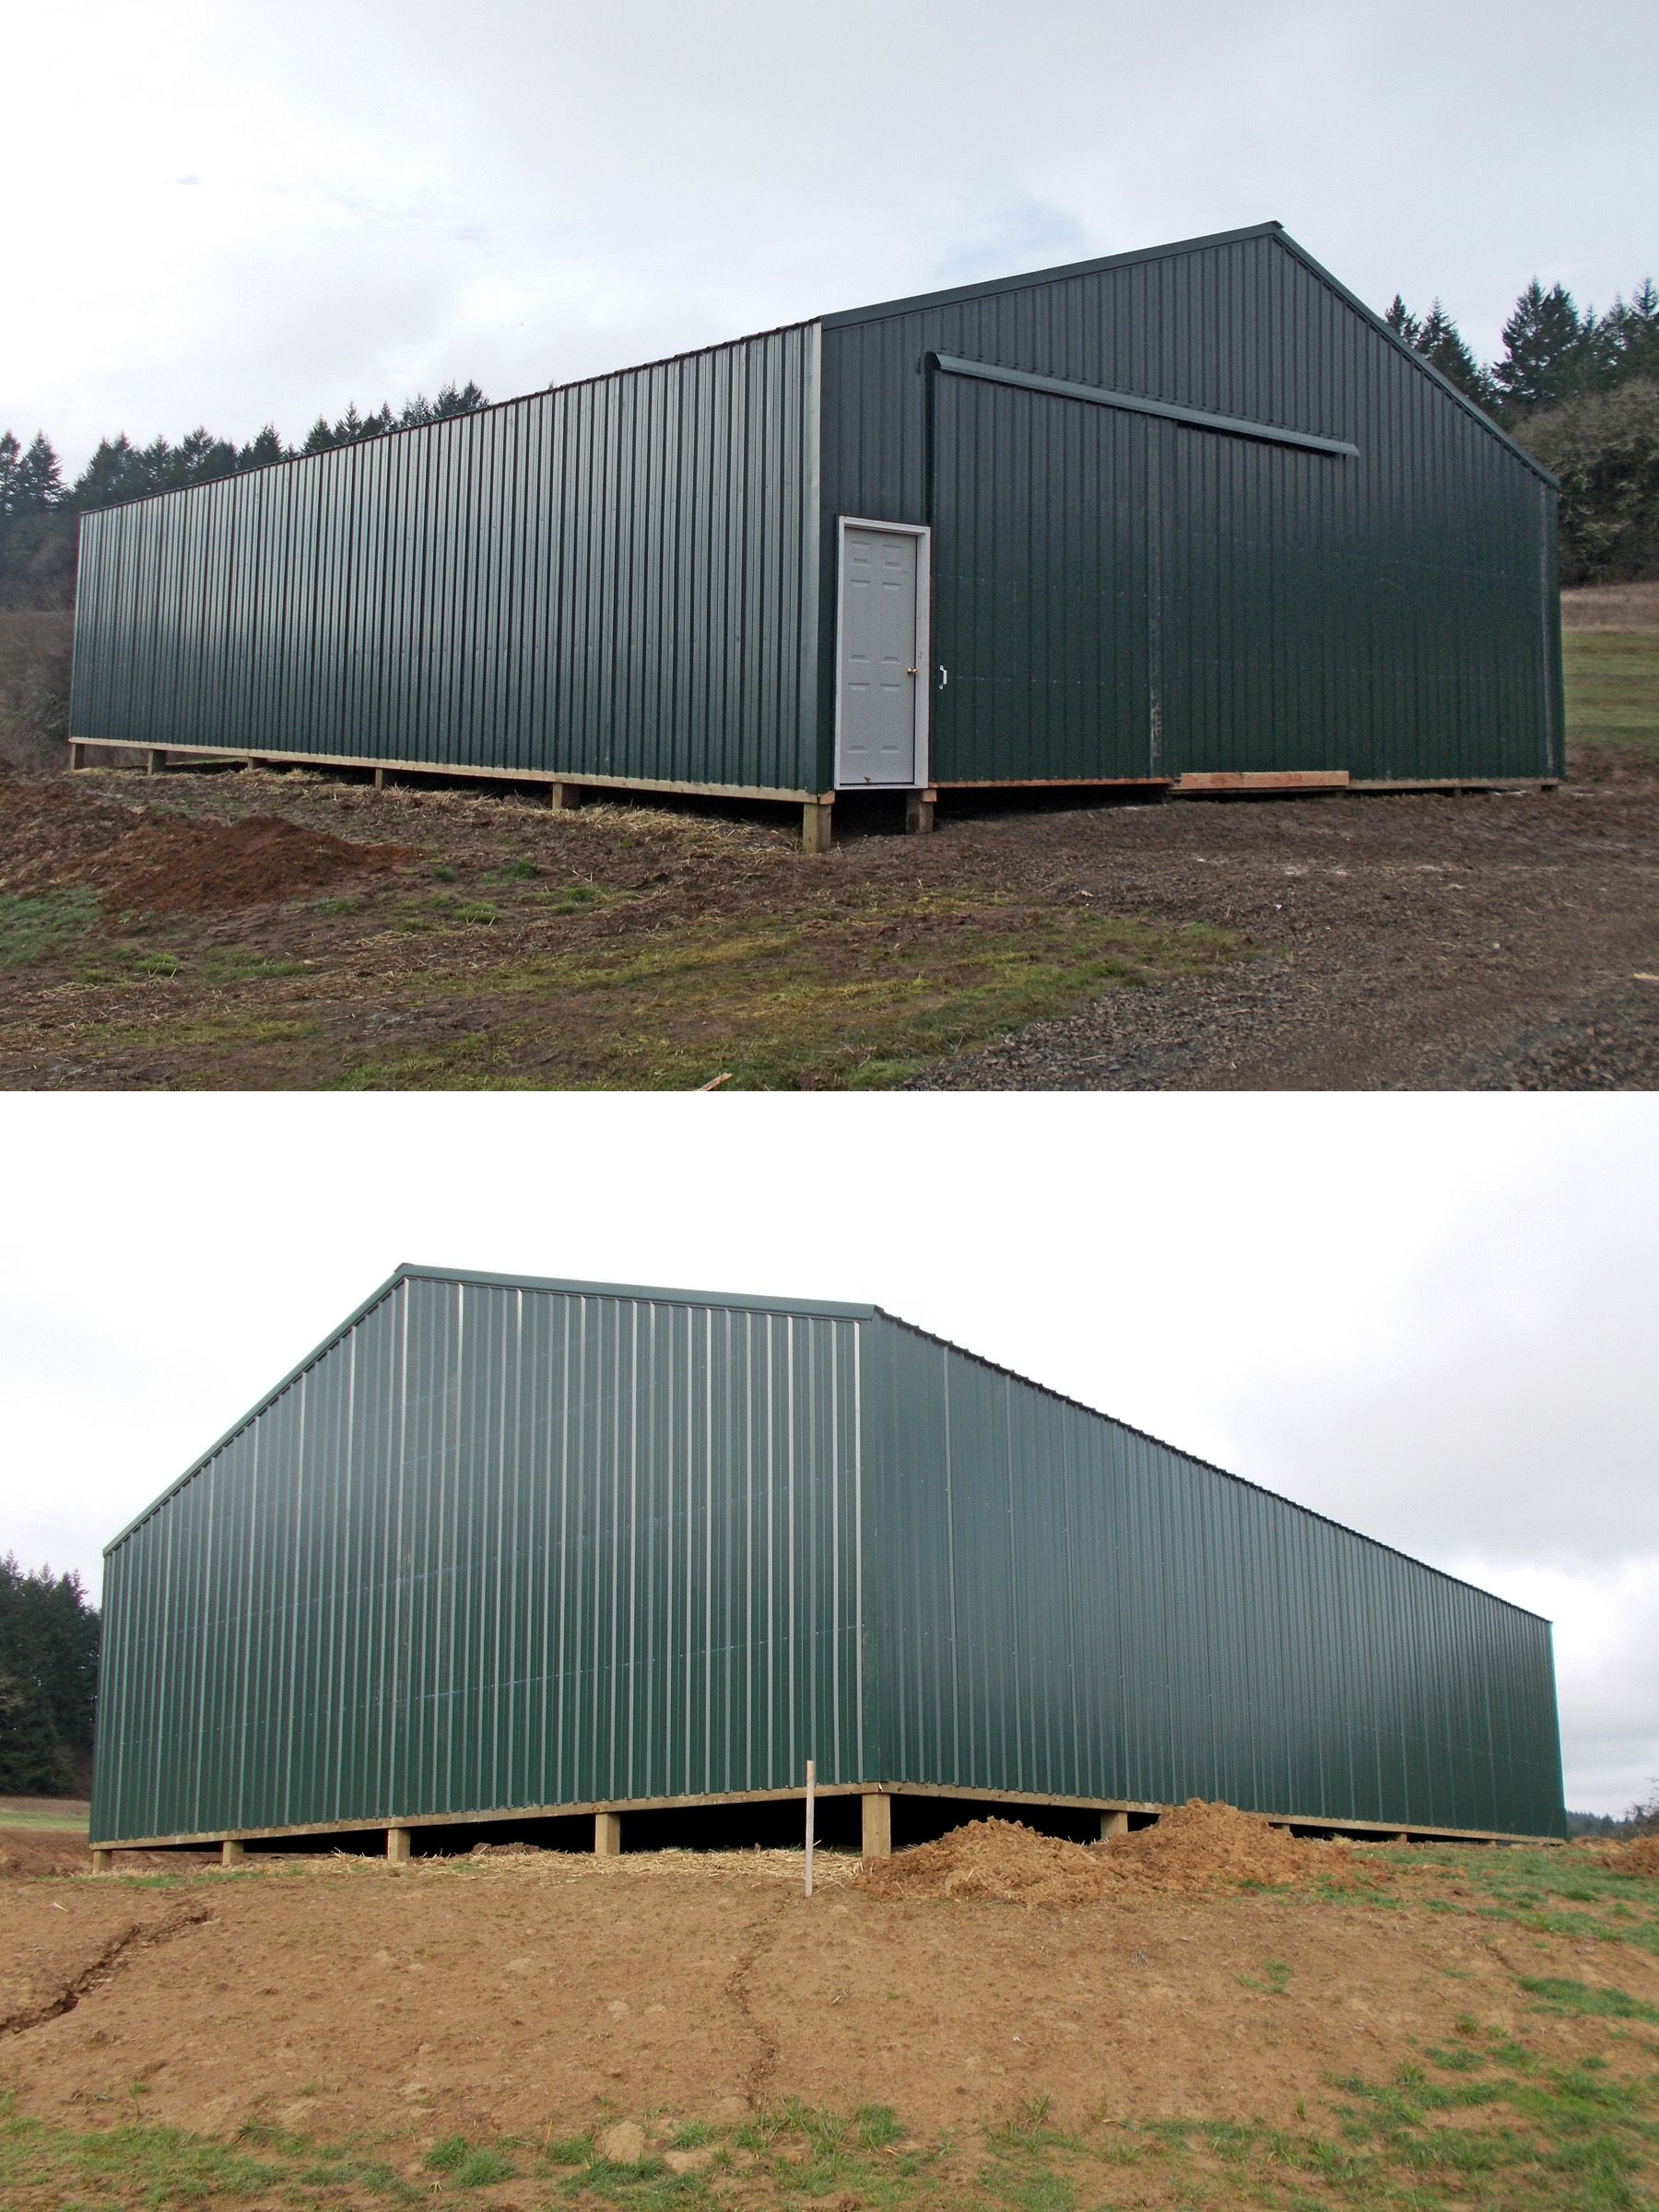 40' x 60' x 12' agriculture building with a slider door and walk-in door. www.econofabbuildings.com